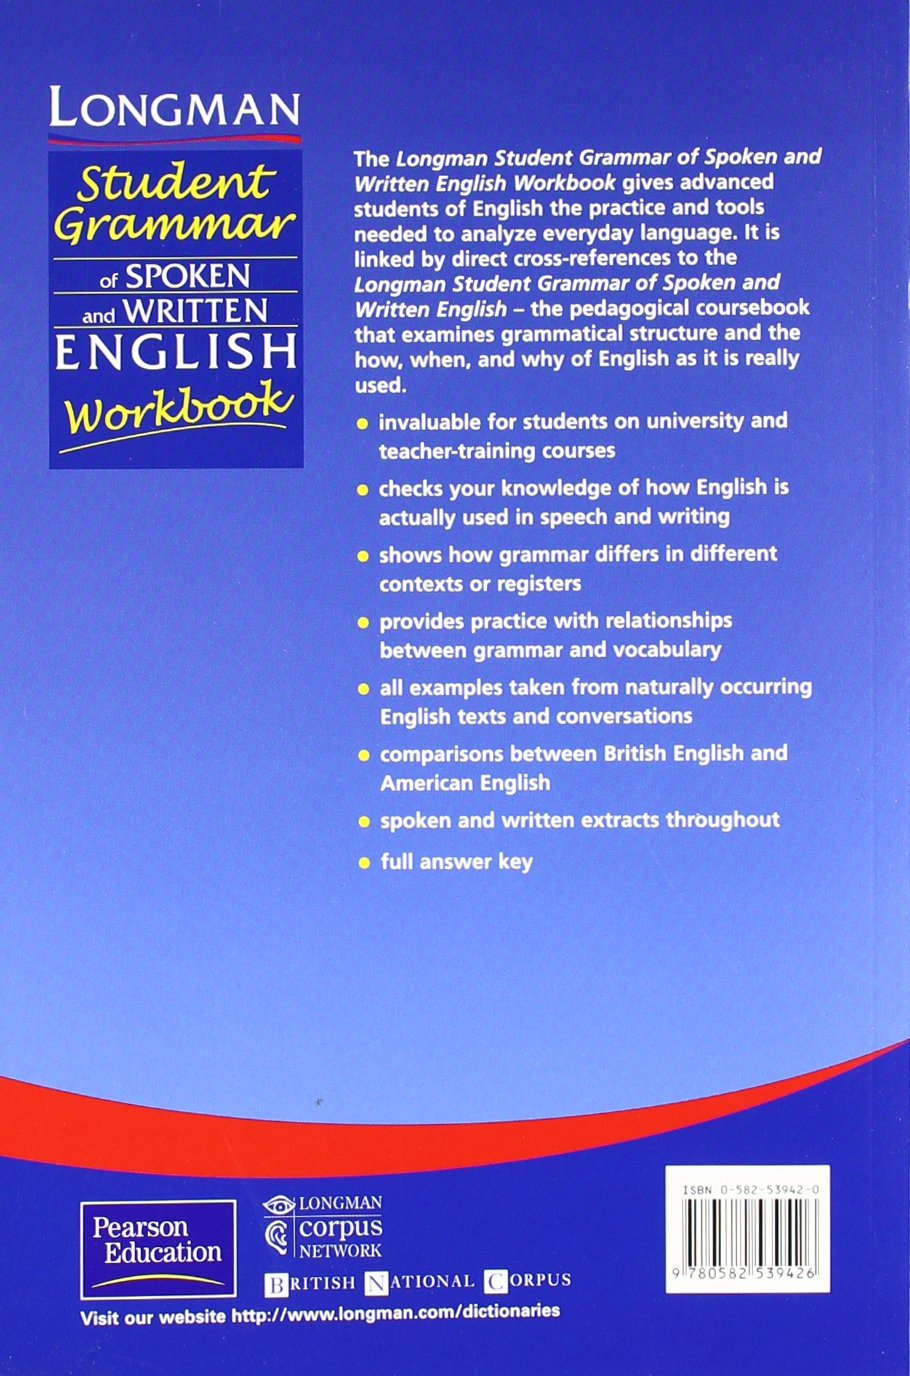 Student Grammar of Spoken and Written English: Workbook Grammar Reference: Amazon.es: Biber, Douglas: Libros en idiomas extranjeros